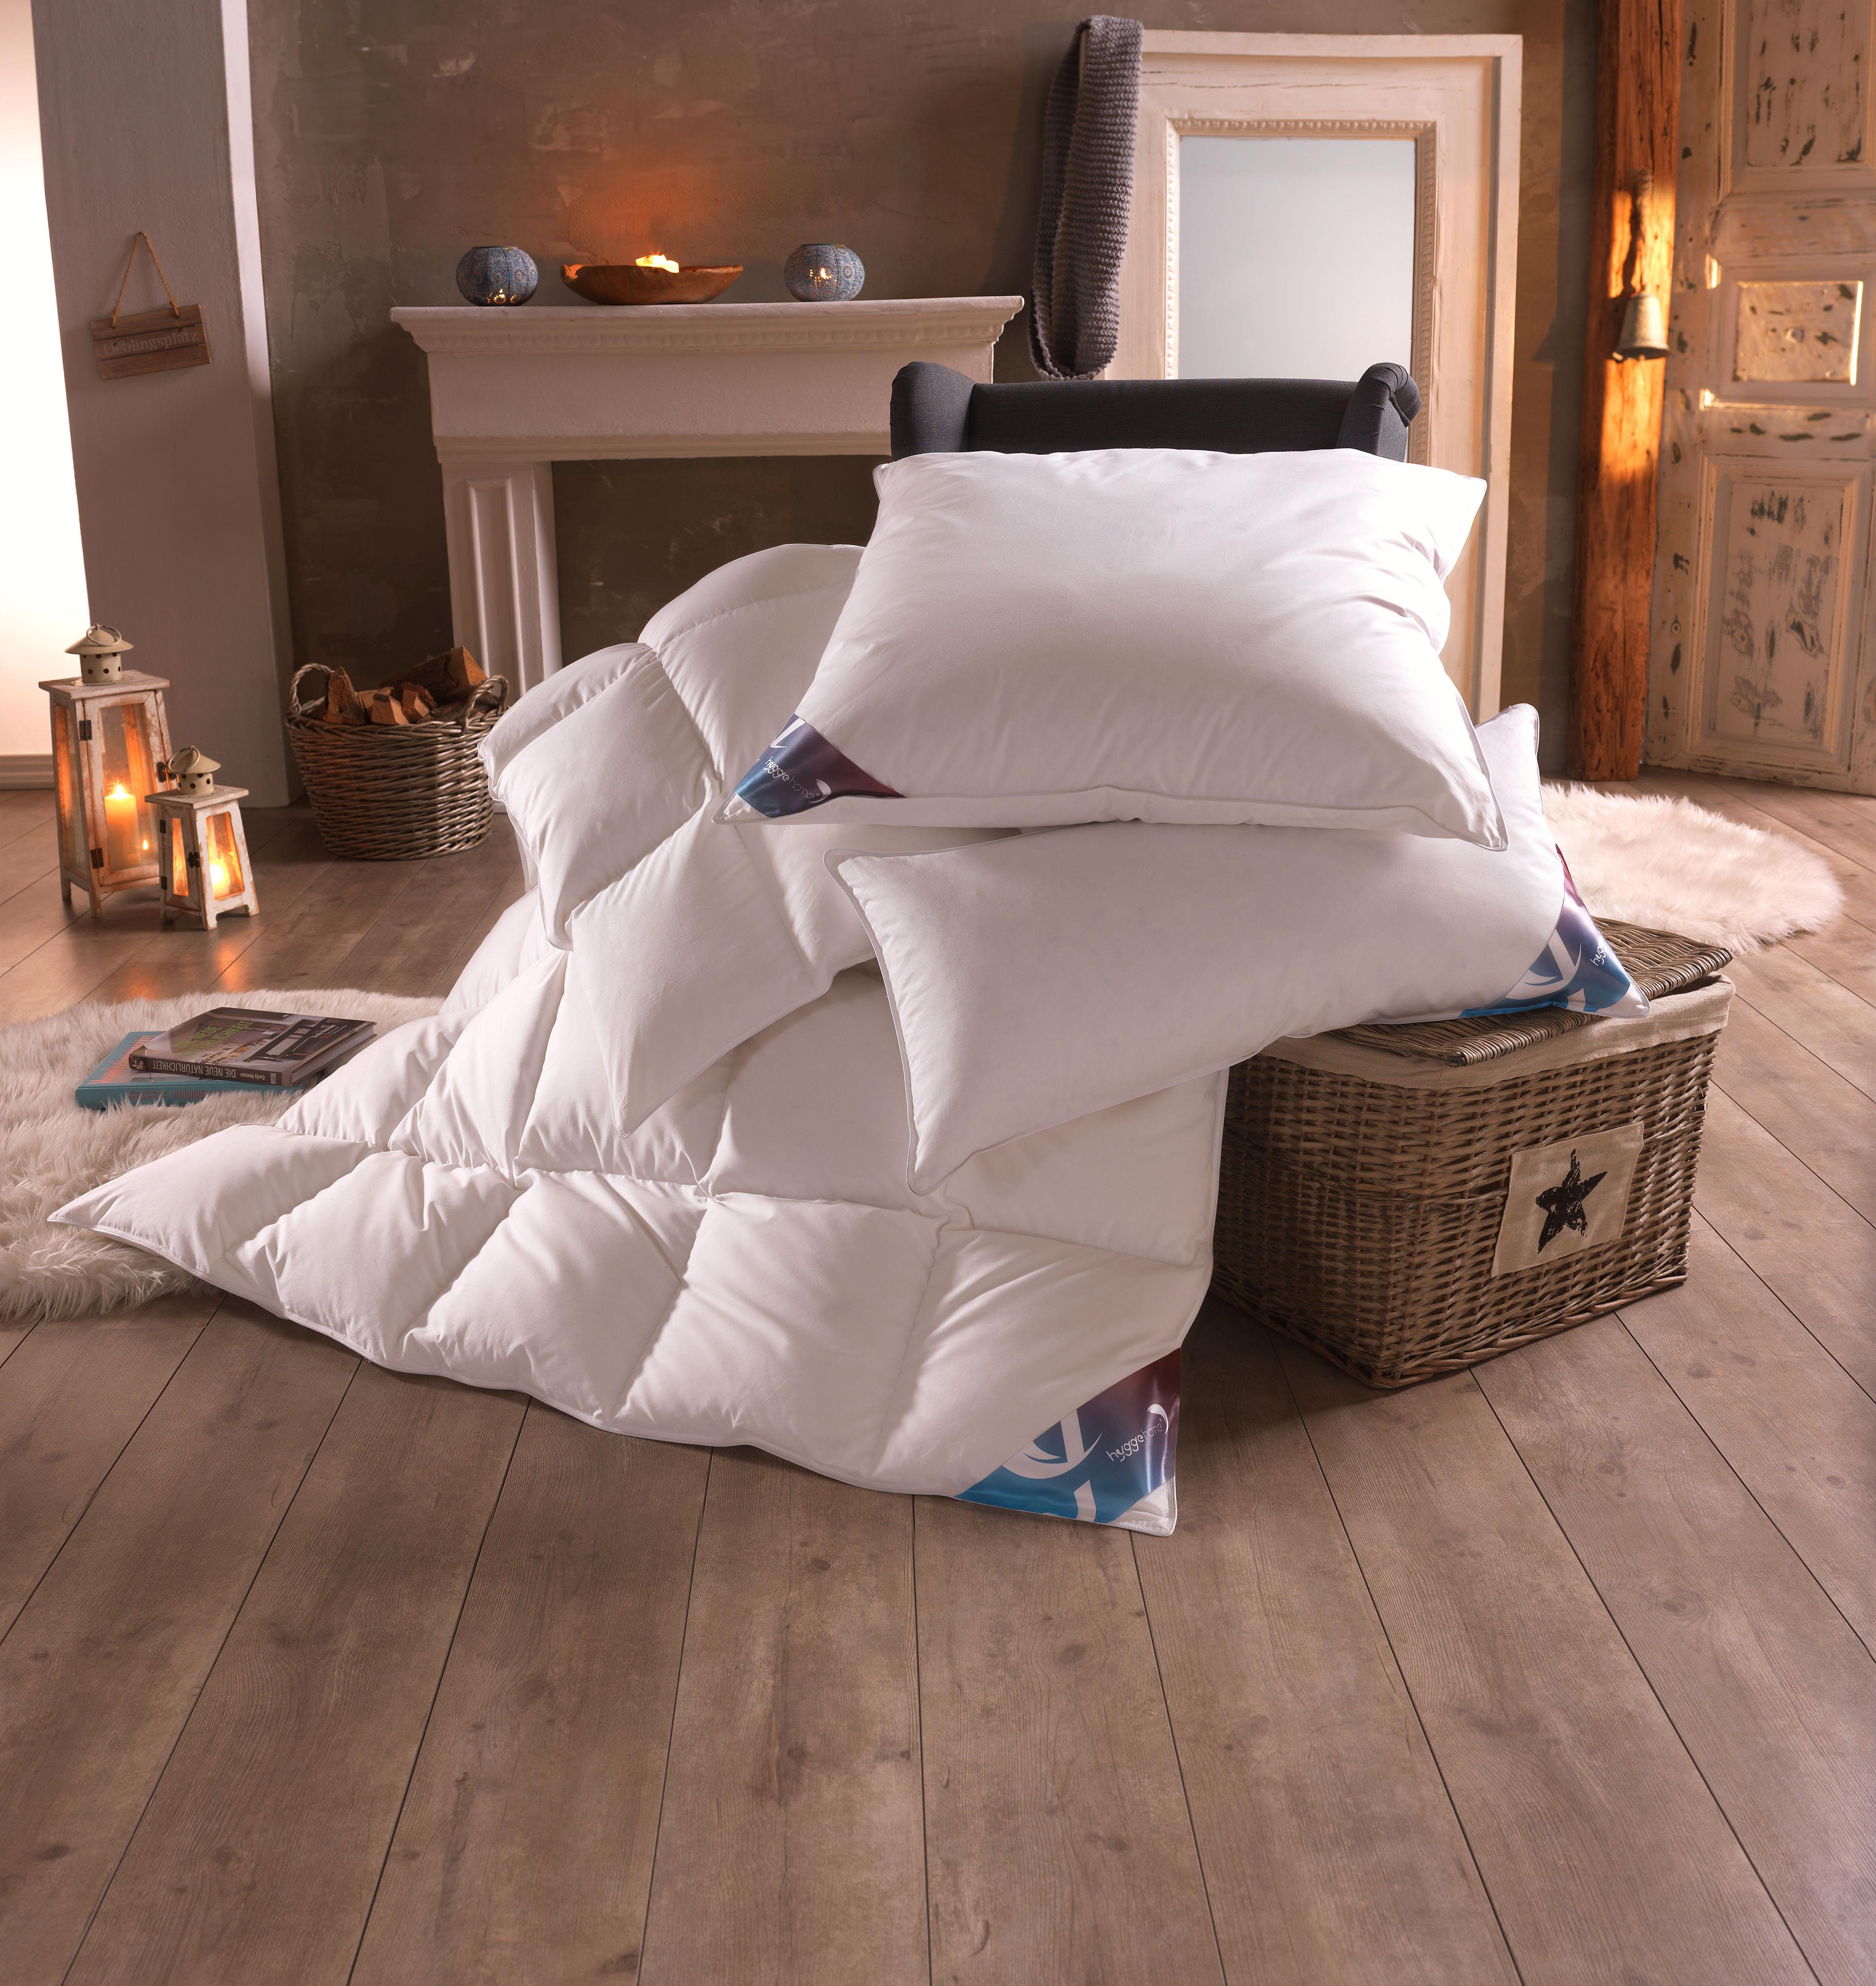 3-Kammer-Kopfkissen, Luxus Hygge, hyggehome | Heimtextilien > Decken und Kissen > Kopfkissen | Hyggehome